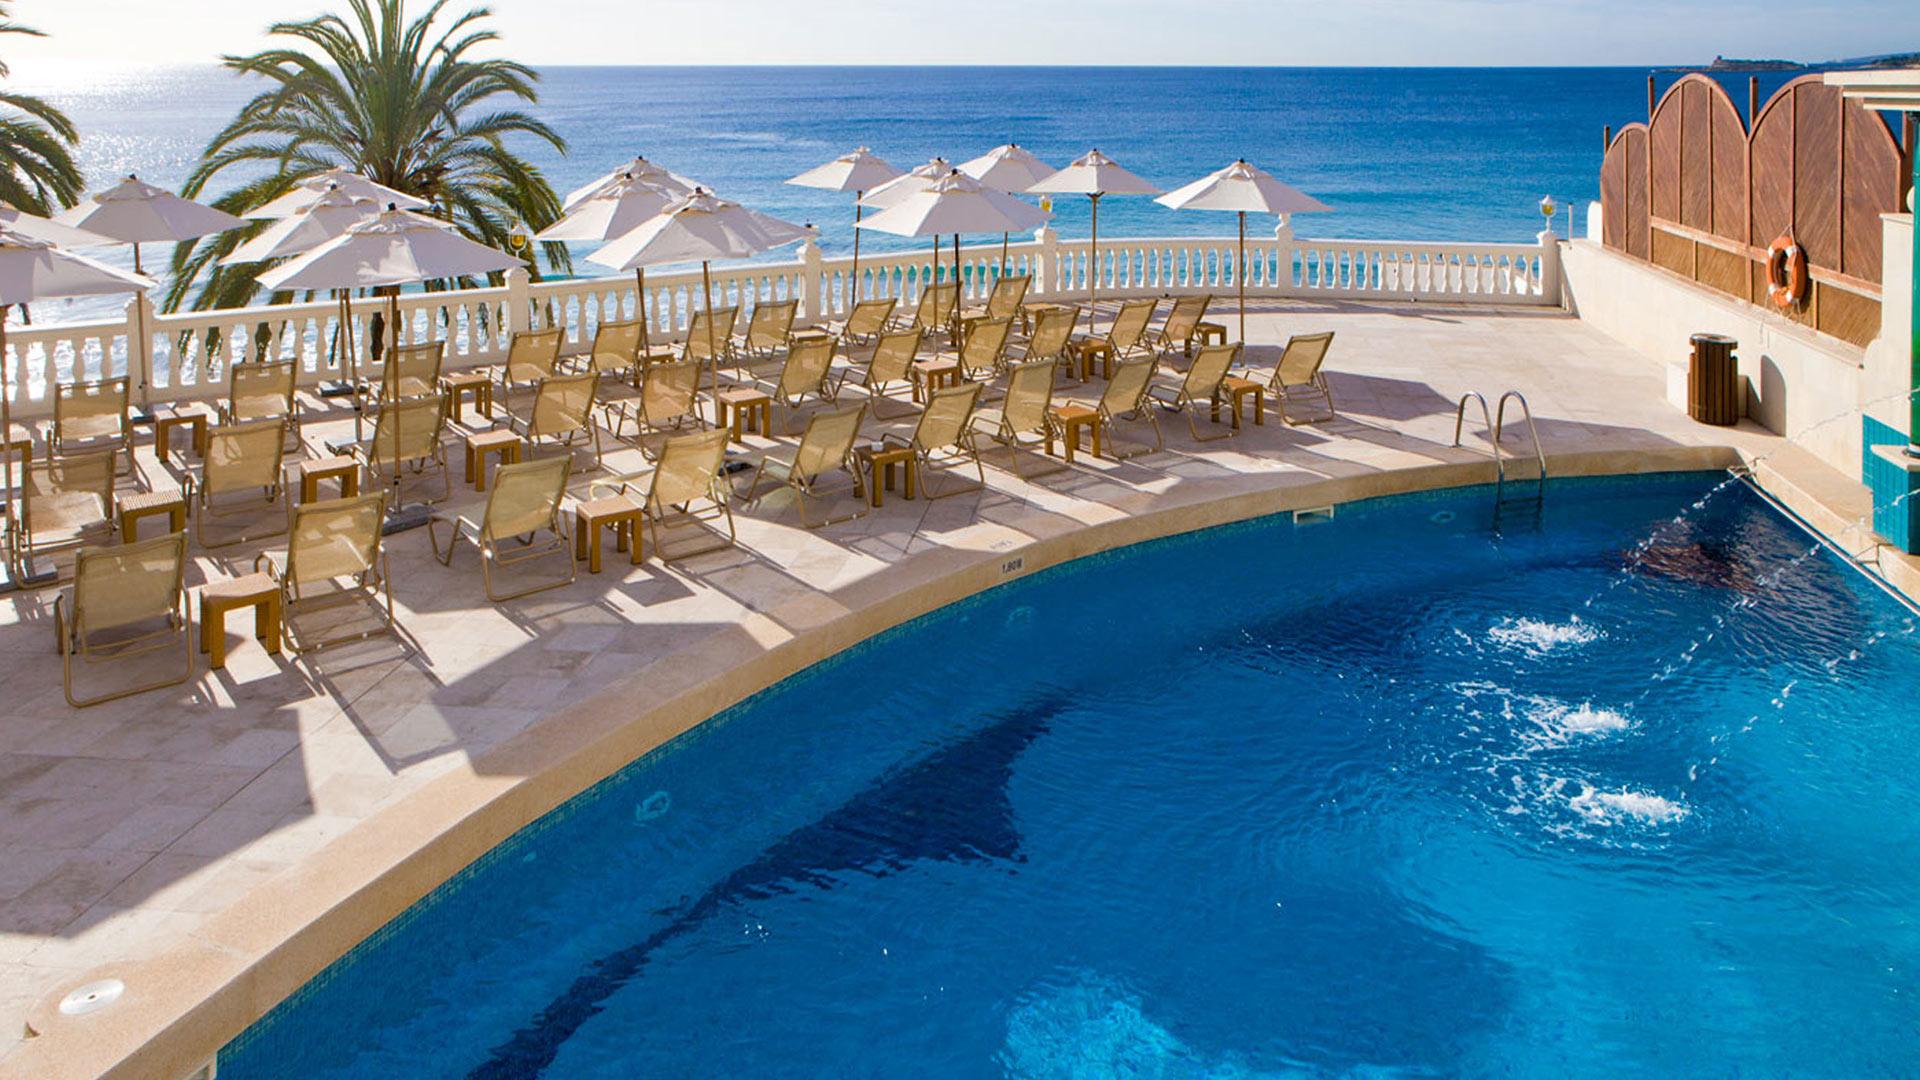 Nixe Palace Hotel Mallorca Hoteles Santos MADMENMAG 2